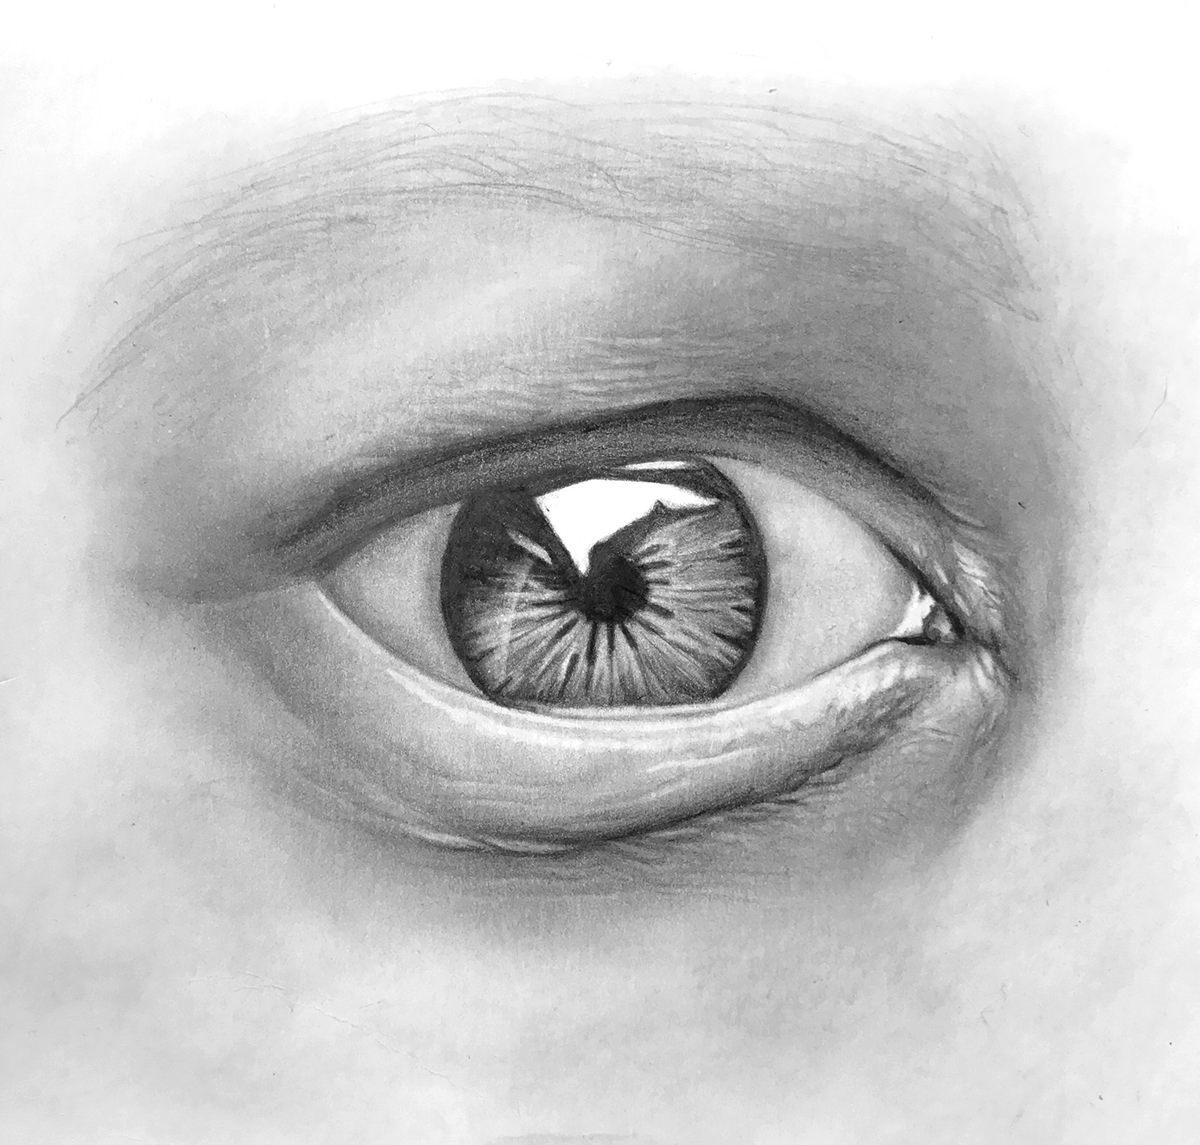 draw-a-realistic-eye-step-11-more-details.jpg